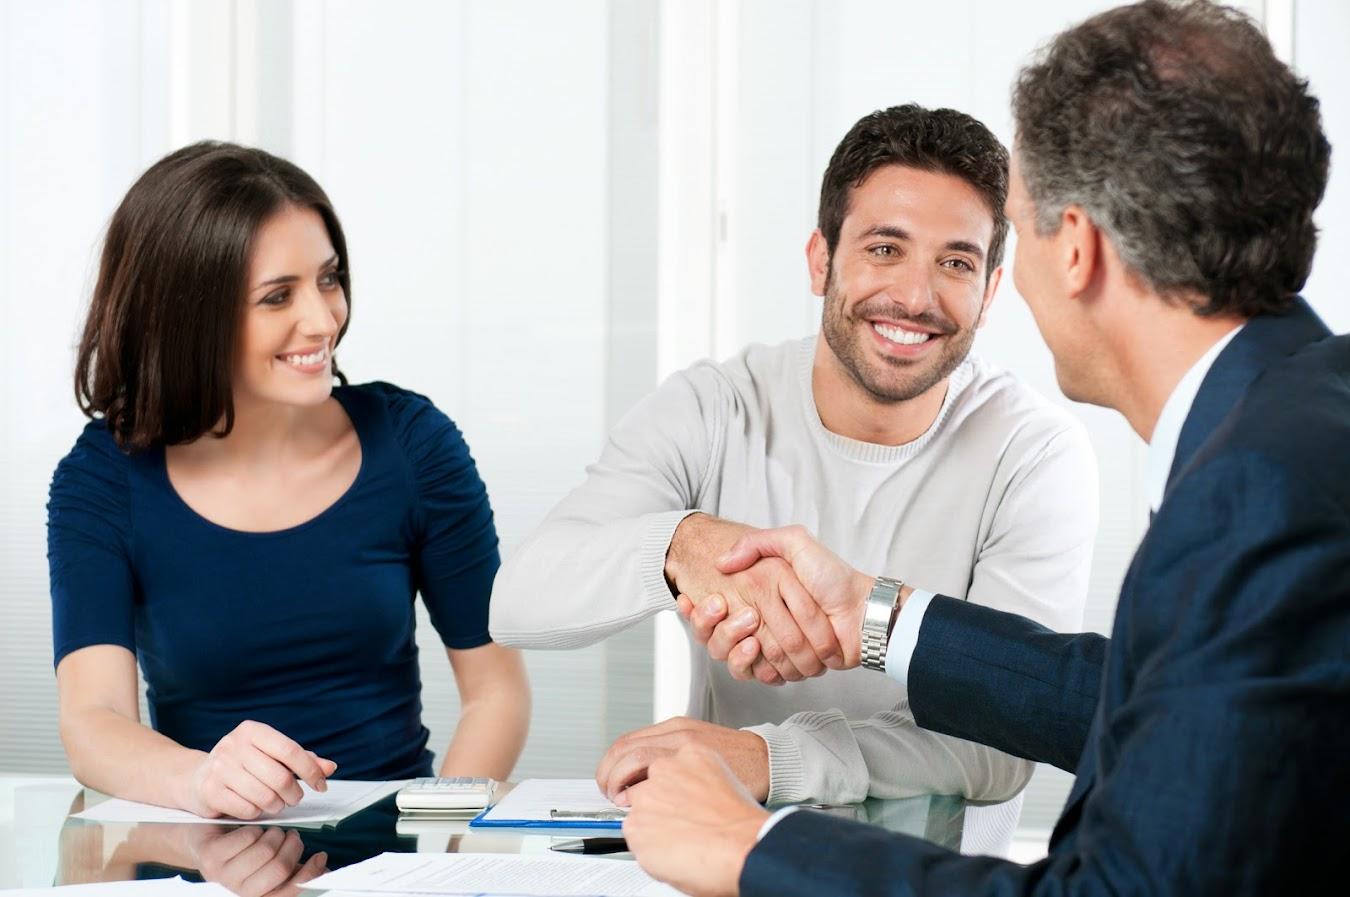 Couple Meeting With Albuquerque Insurance Agent - Albuquerque Insurance World